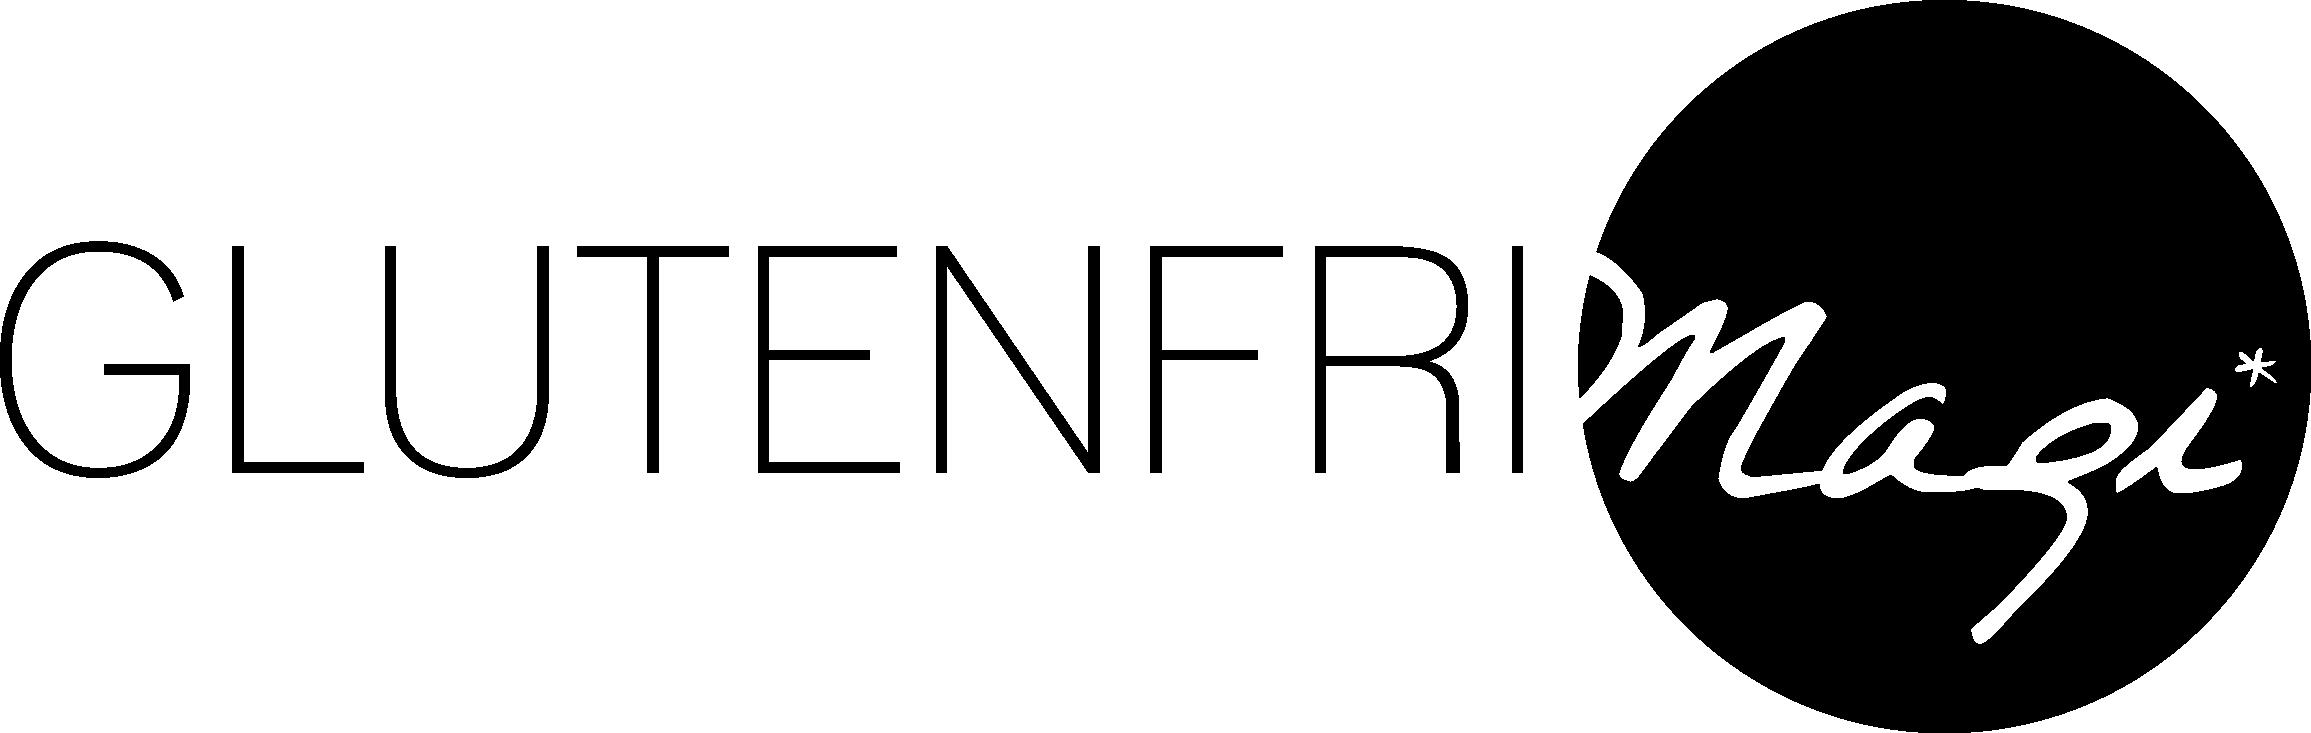 Glutenfri Magi logo